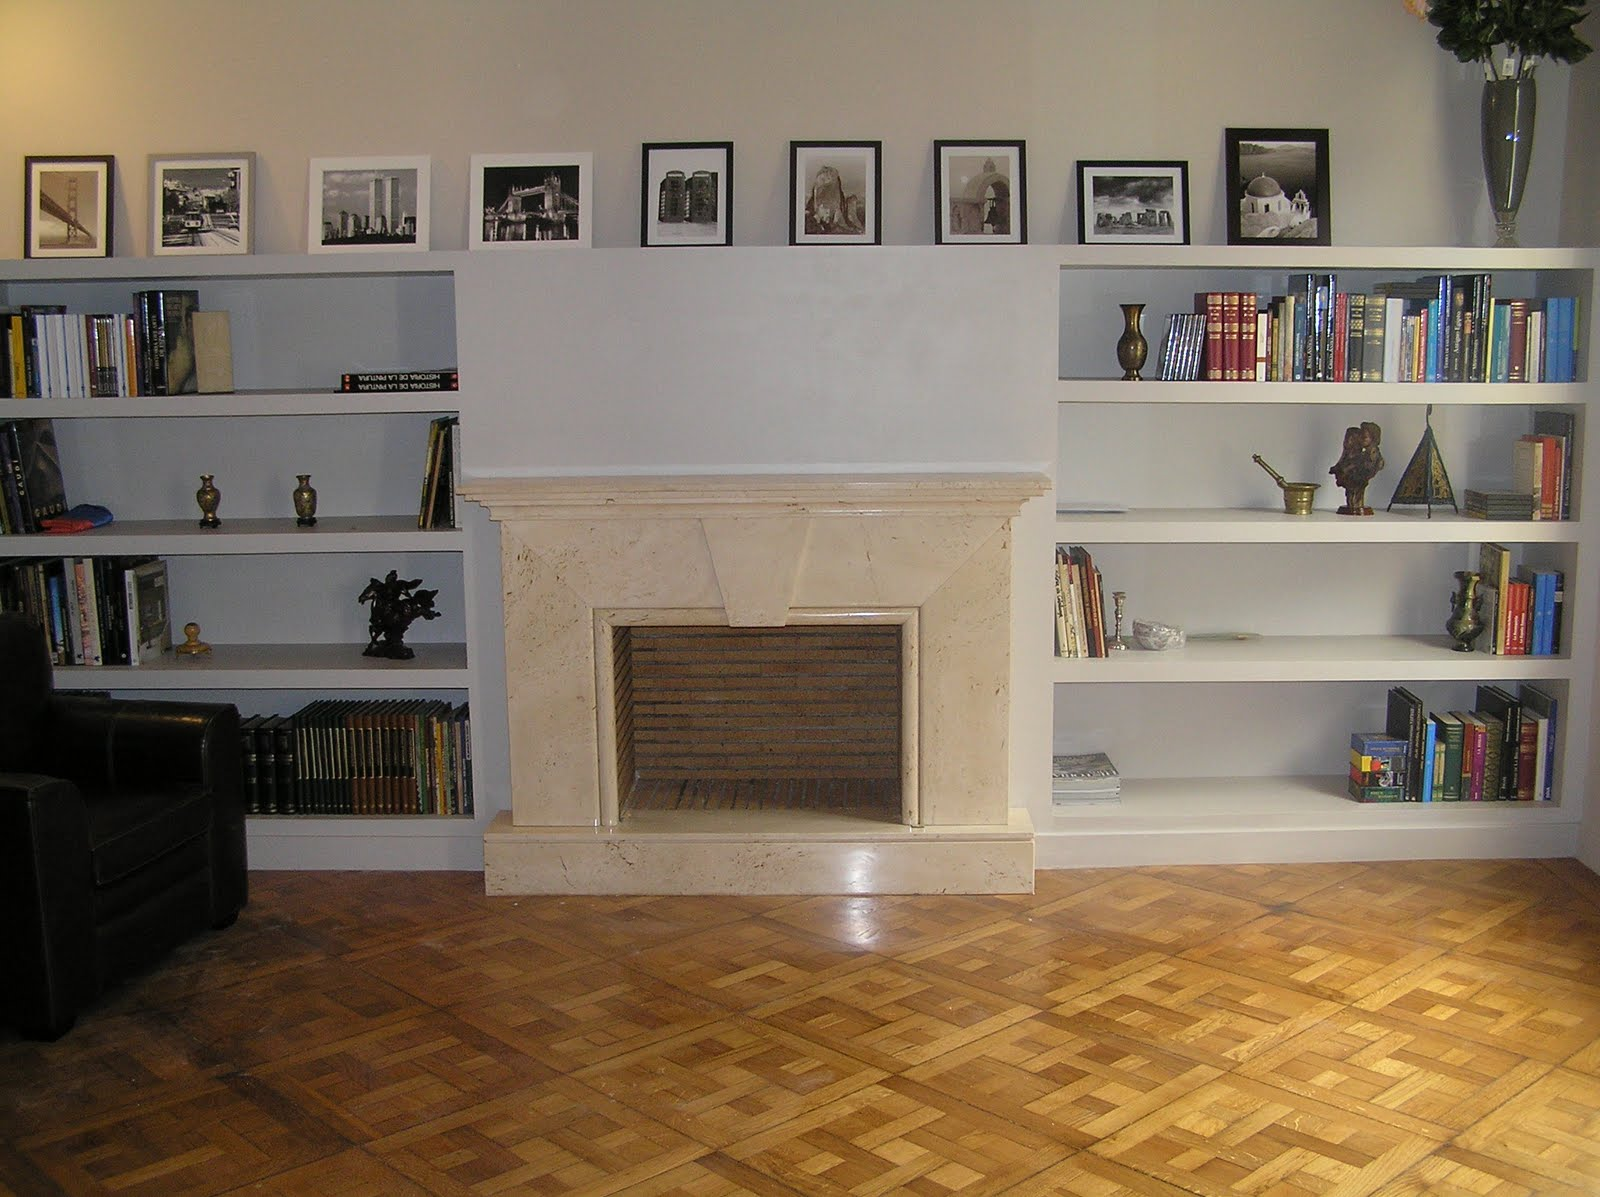 Reformas barcelona stanley 698 372 093 mueble de pladur - Decoracion salon con chimenea ...